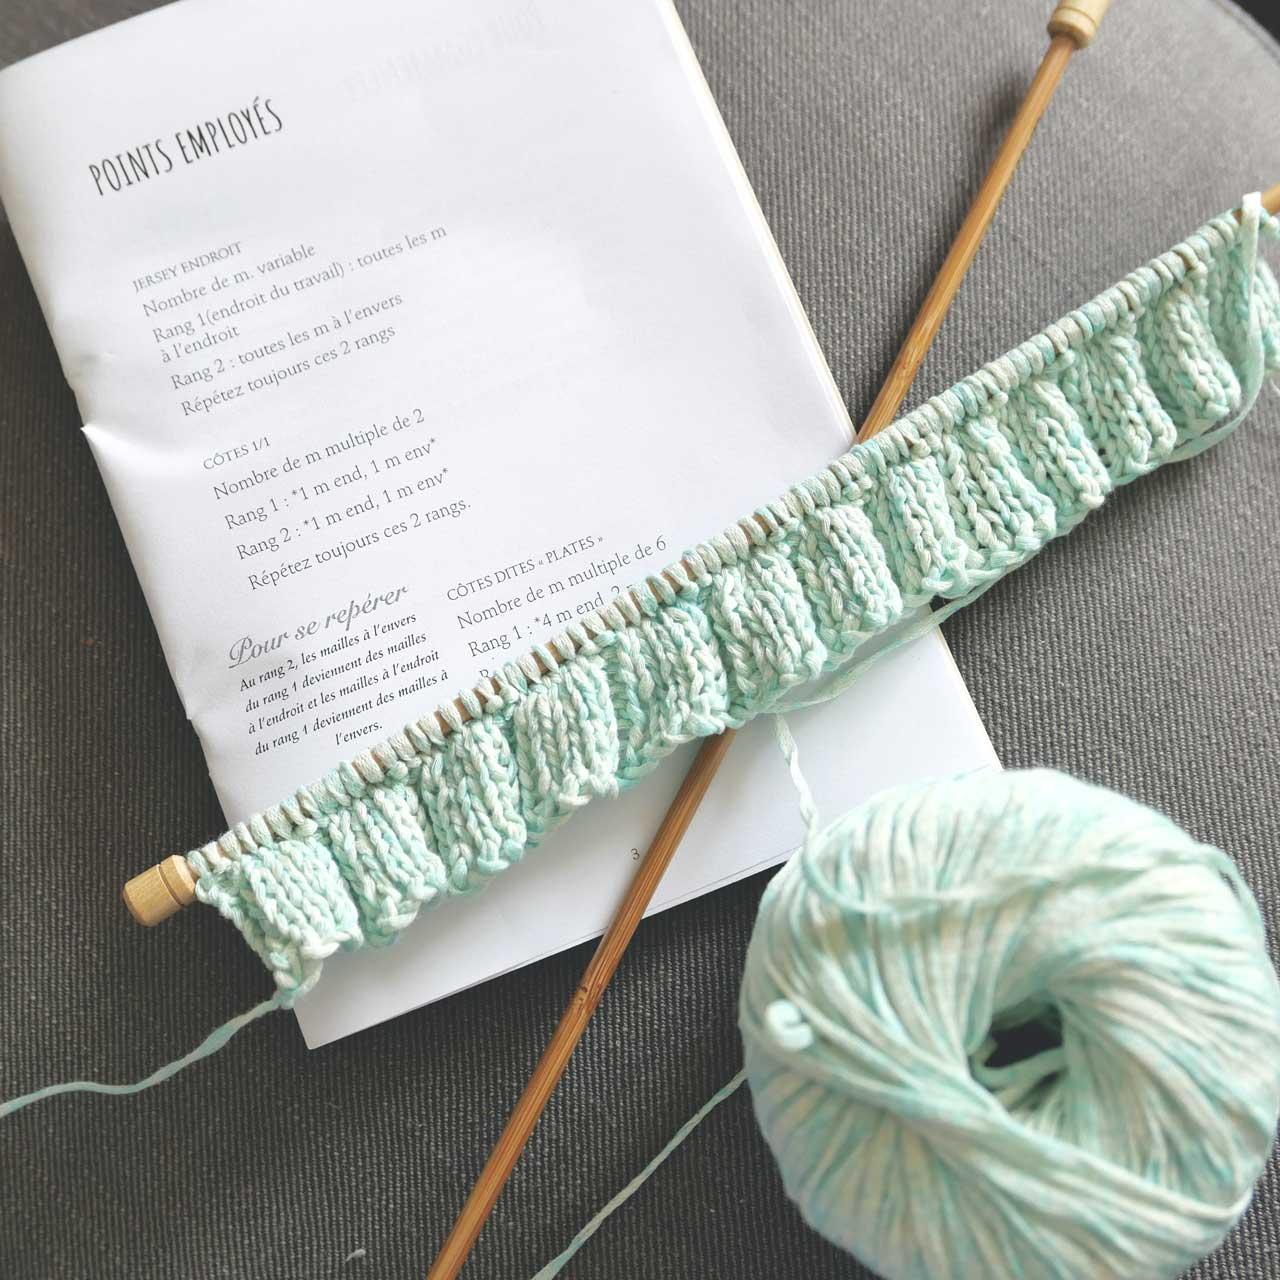 Idee-cadeau-kit-tricot-tricotez-moi-1-nelly-genisson